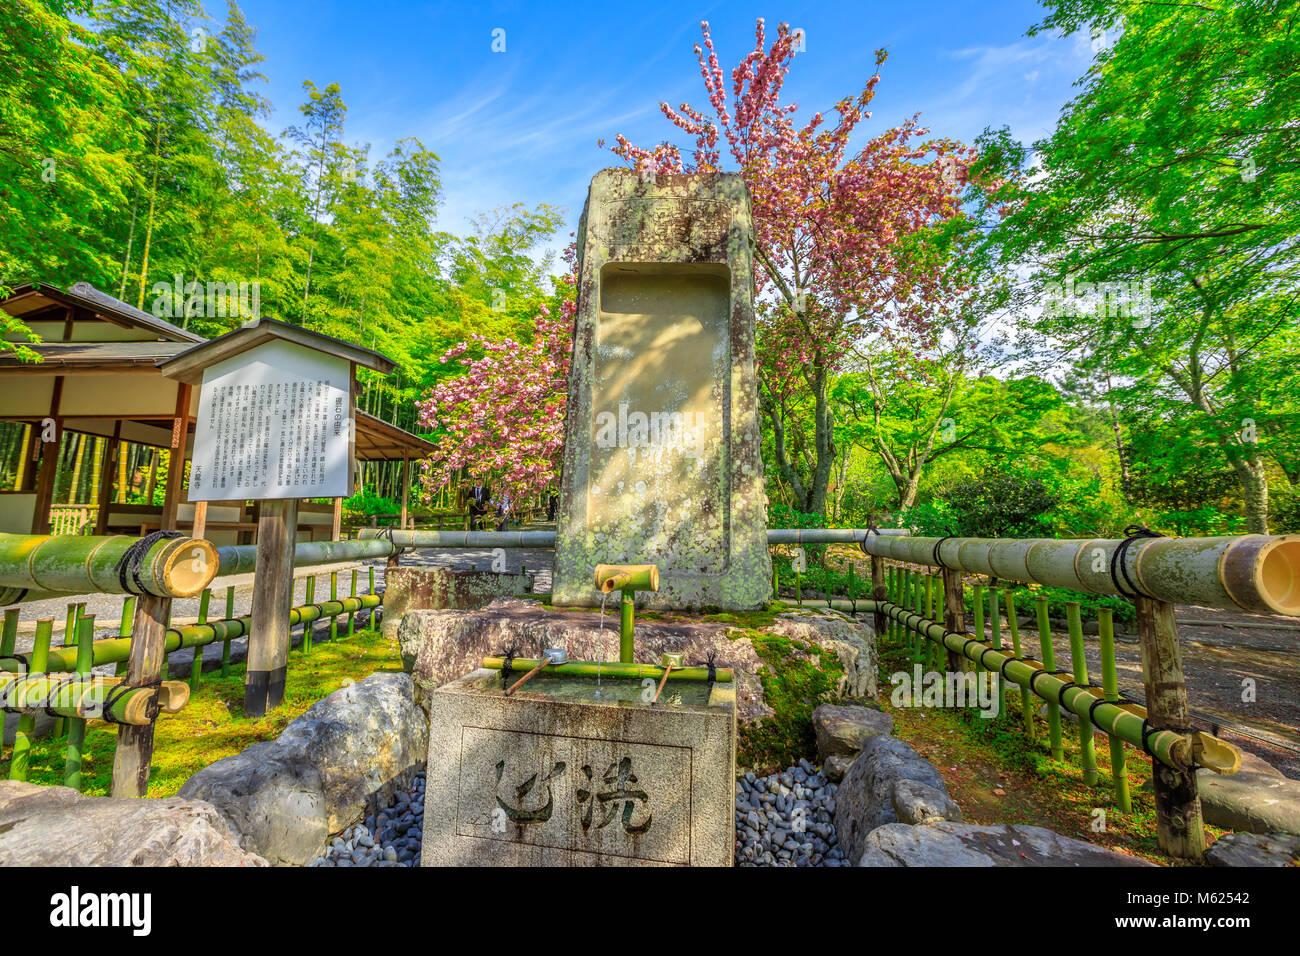 Kyoto, Japan   27. April 2017: Brunnen In Der Hyakka En Garten